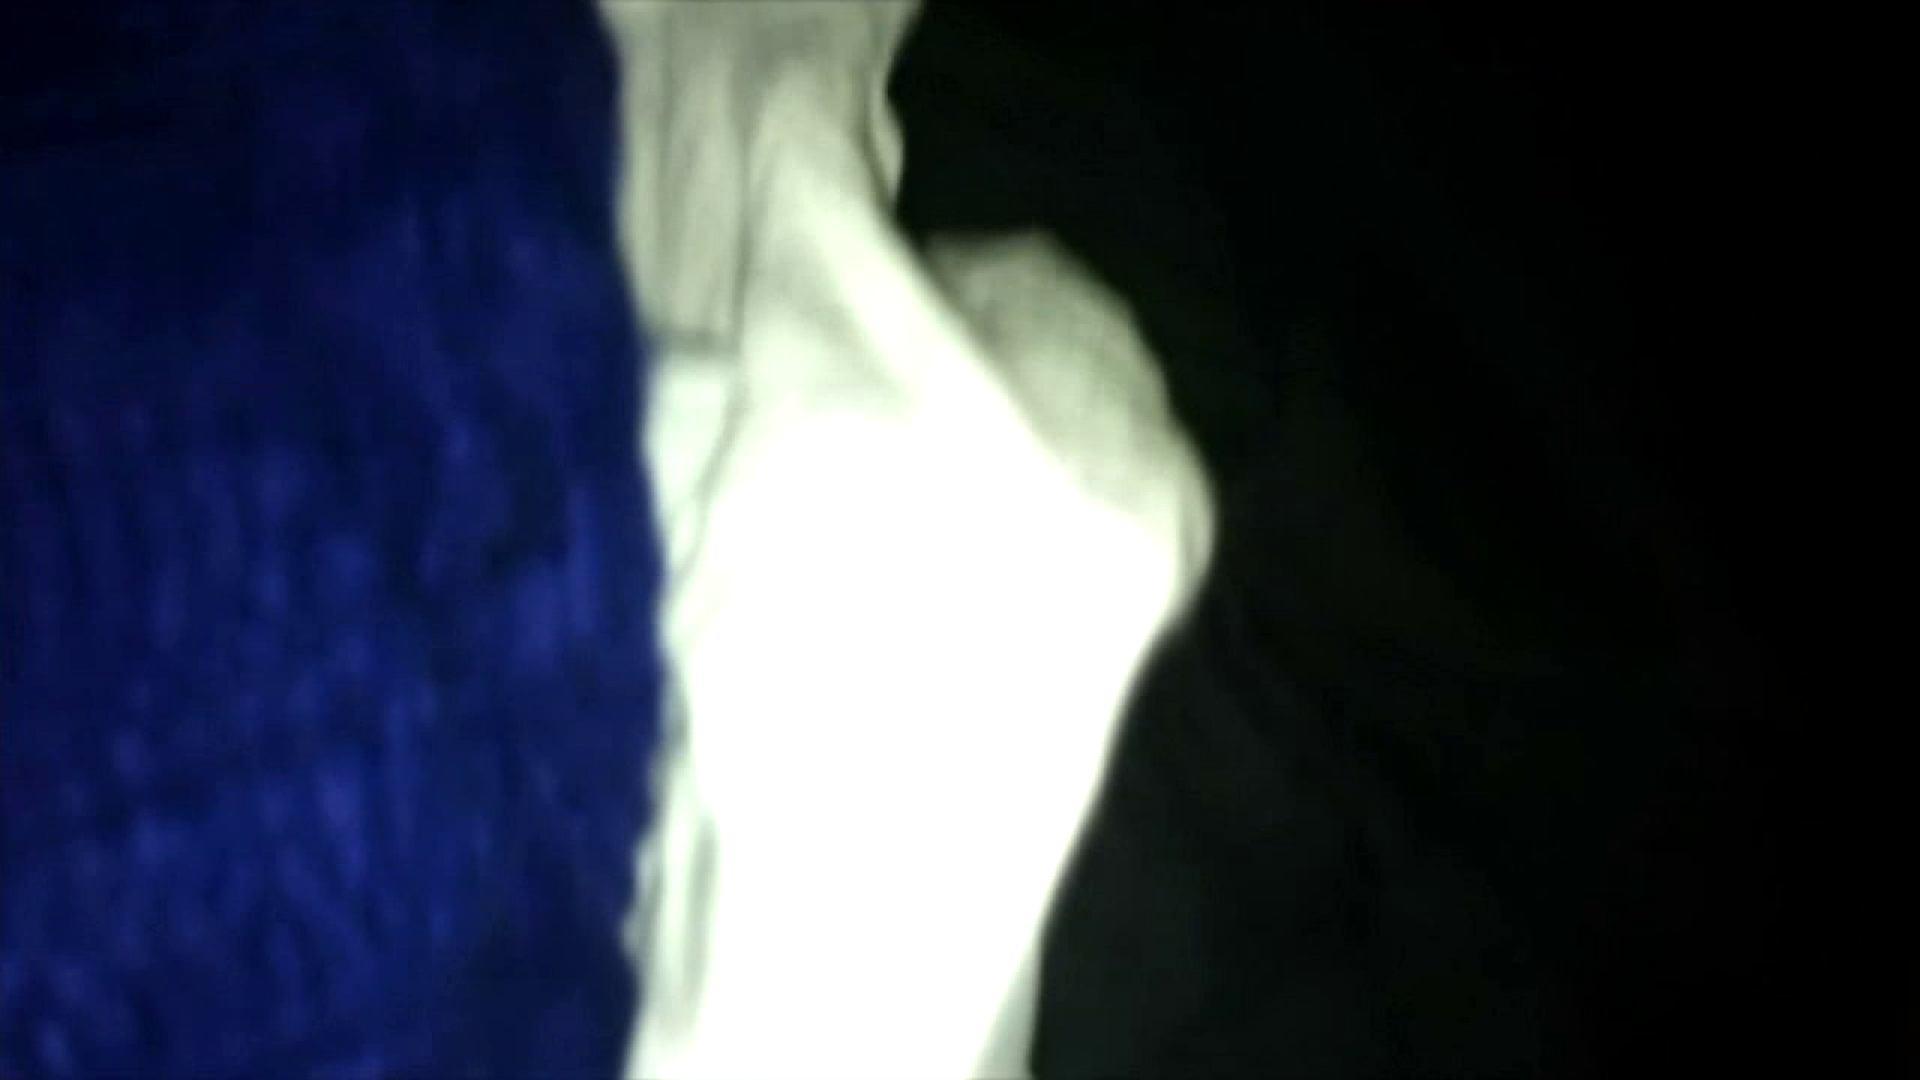 vol.22 【YHちゃん】パルコ店員20歳 mixiオフ会で 女子大生 セックス画像 77画像 13